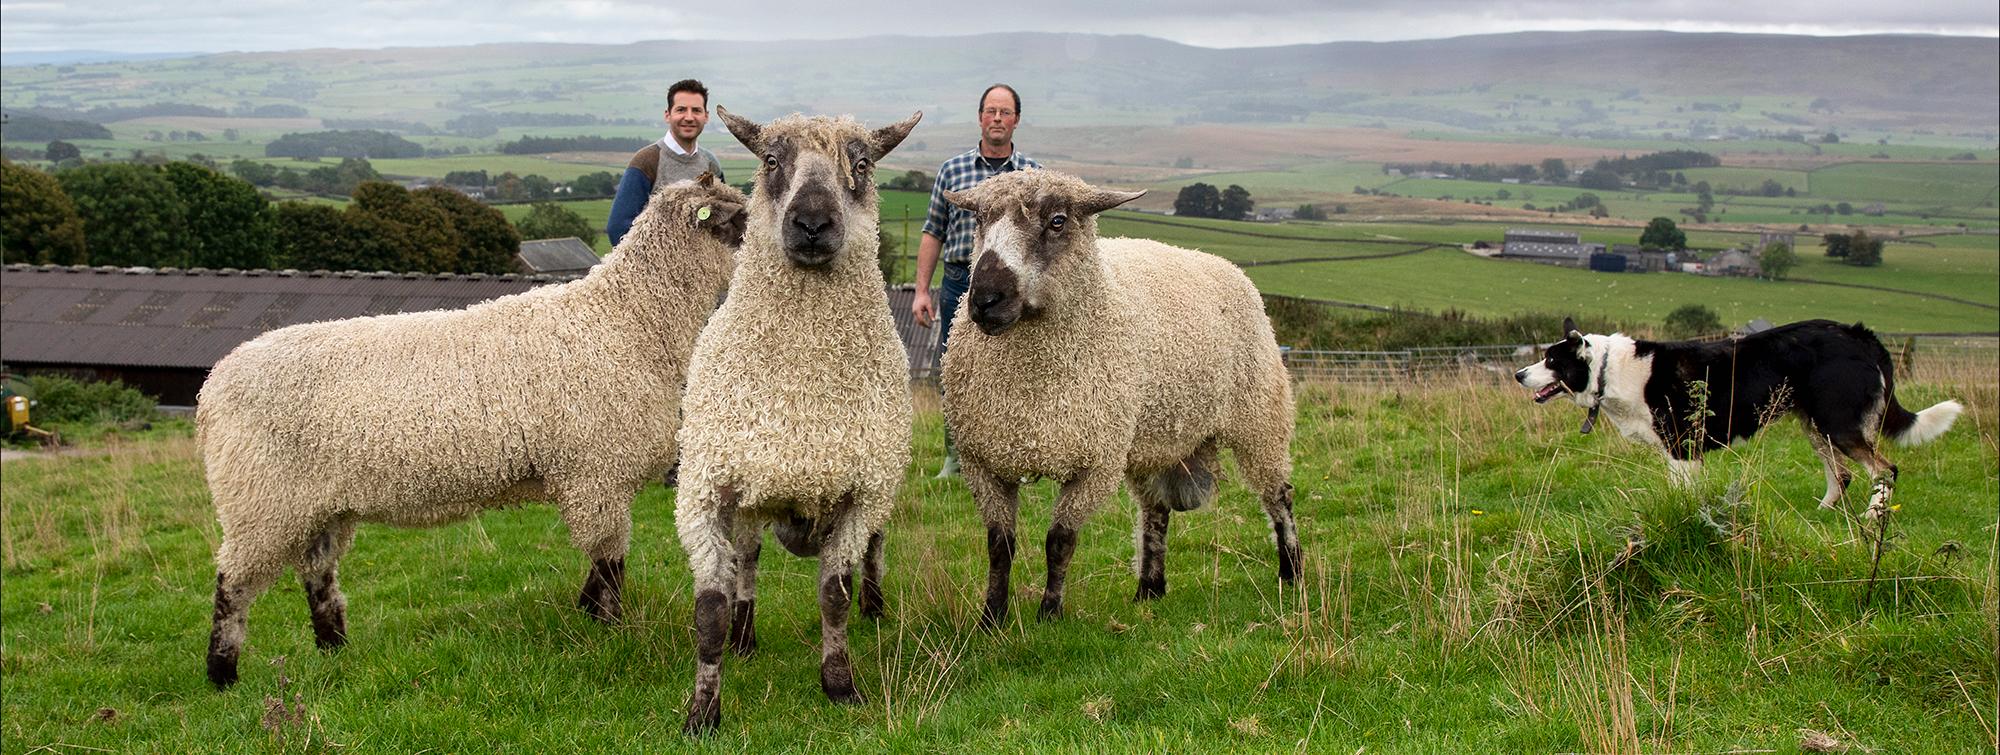 Teeswater sheep and Ed Sexton and John Dawson